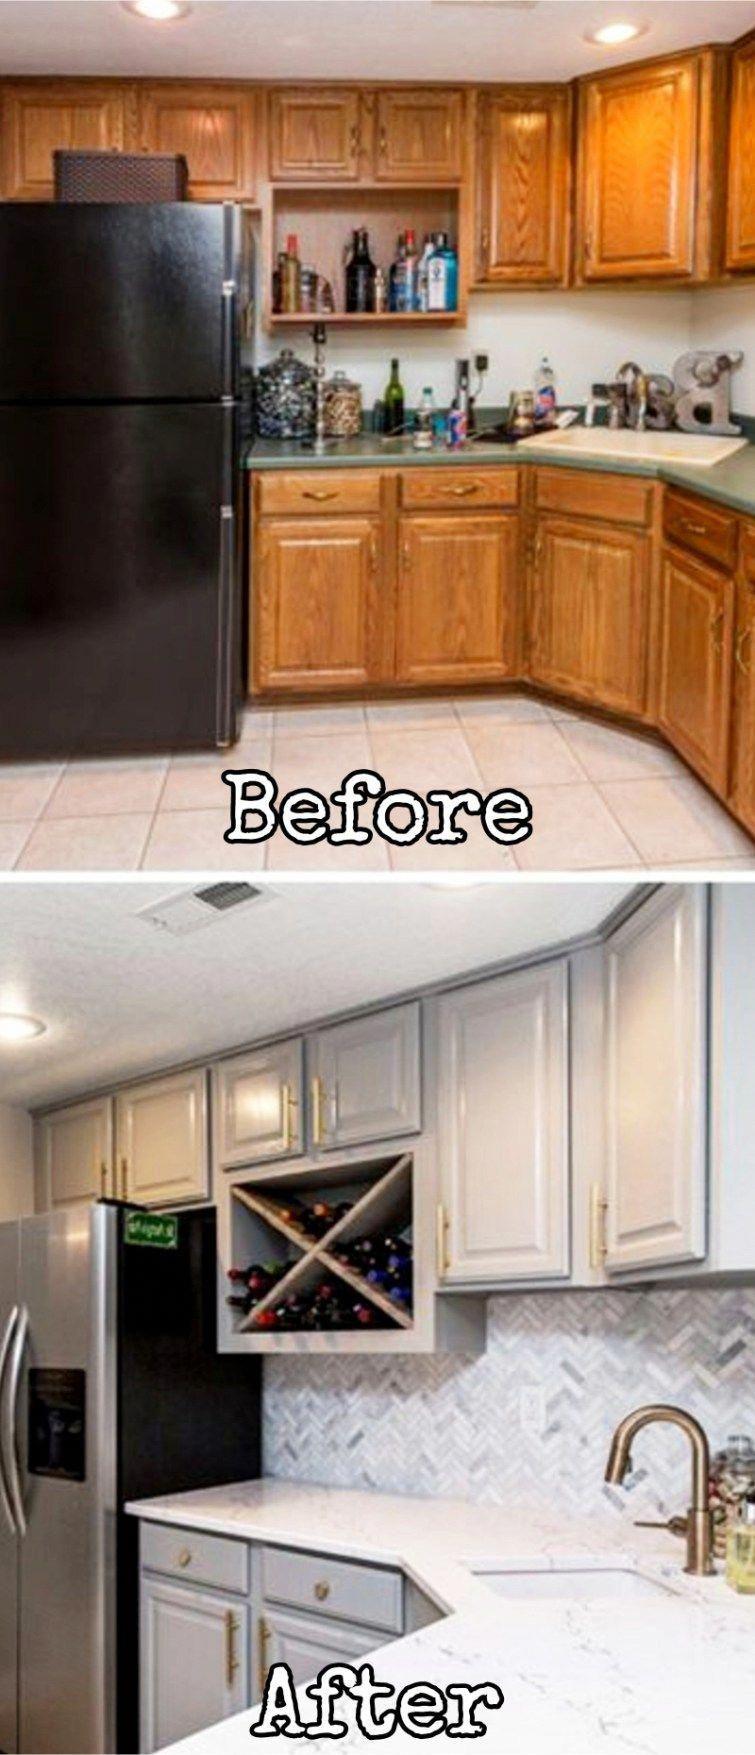 Epingle Sur Mobile Home Kitchen Remodeling